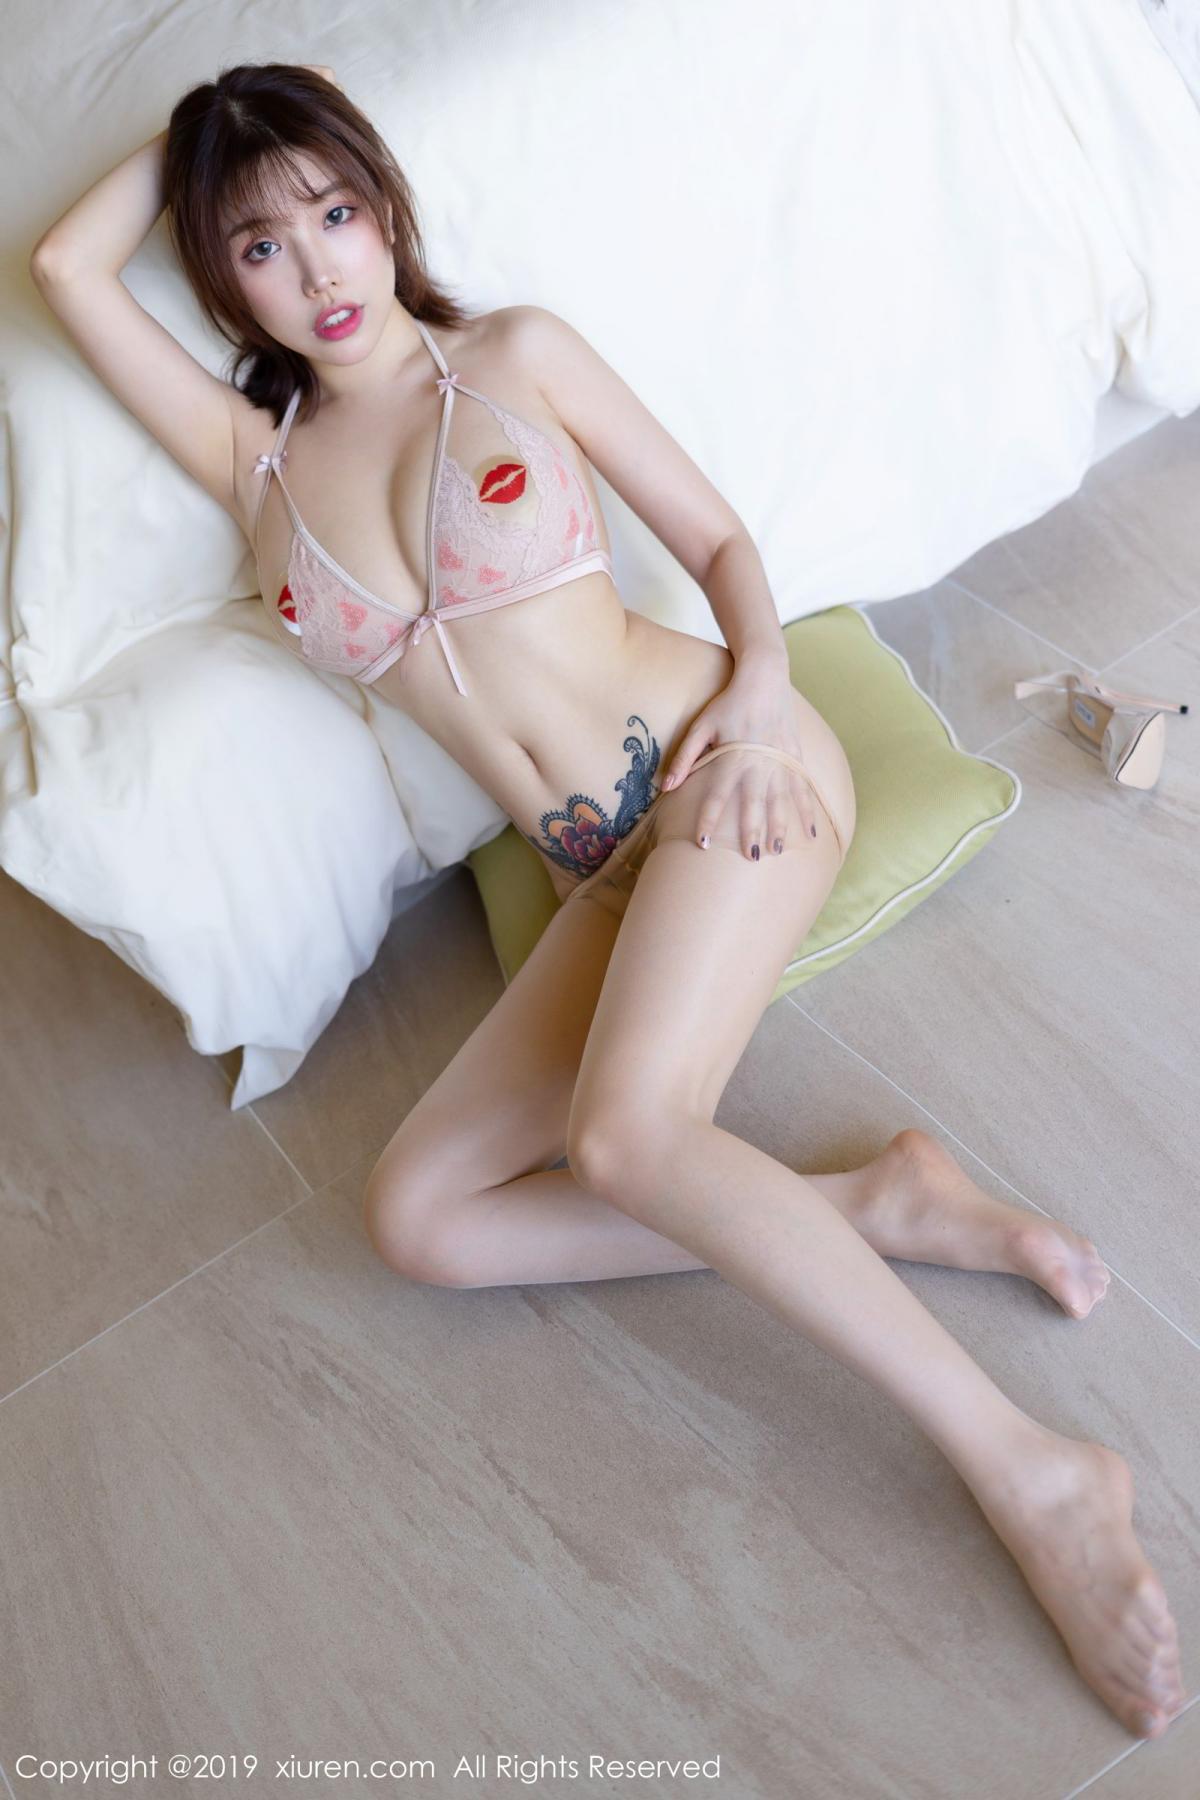 [XiuRen] Vol.1671 Huang Le Ran 22P, Adult, Huang Le Ran, Underwear, Xiuren